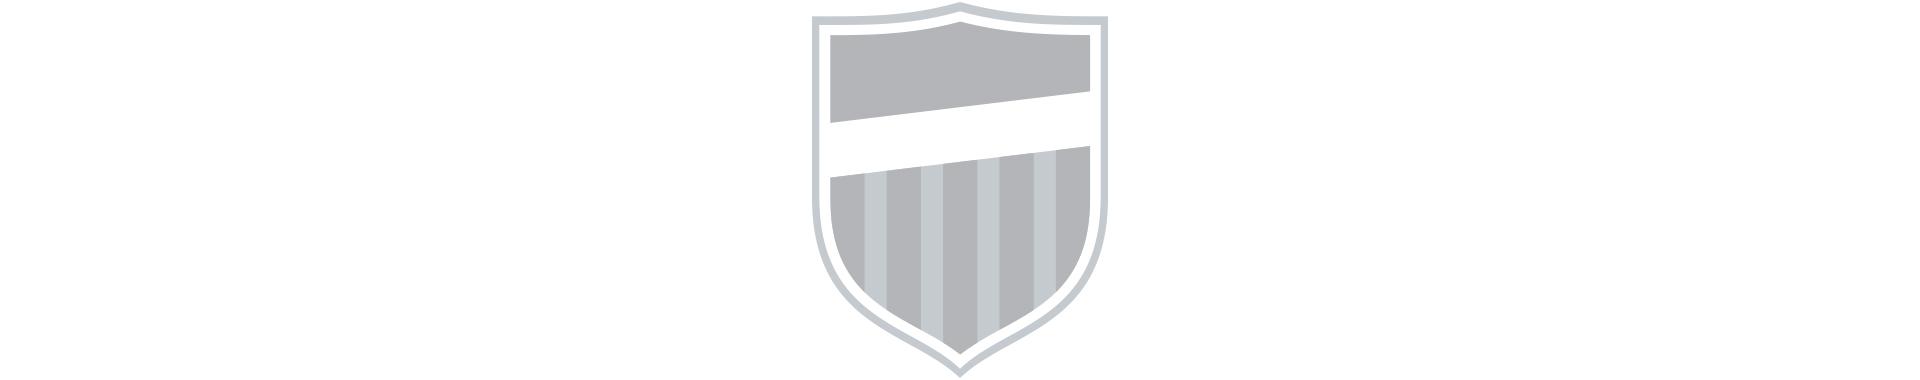 national-sport-organizations.jpg